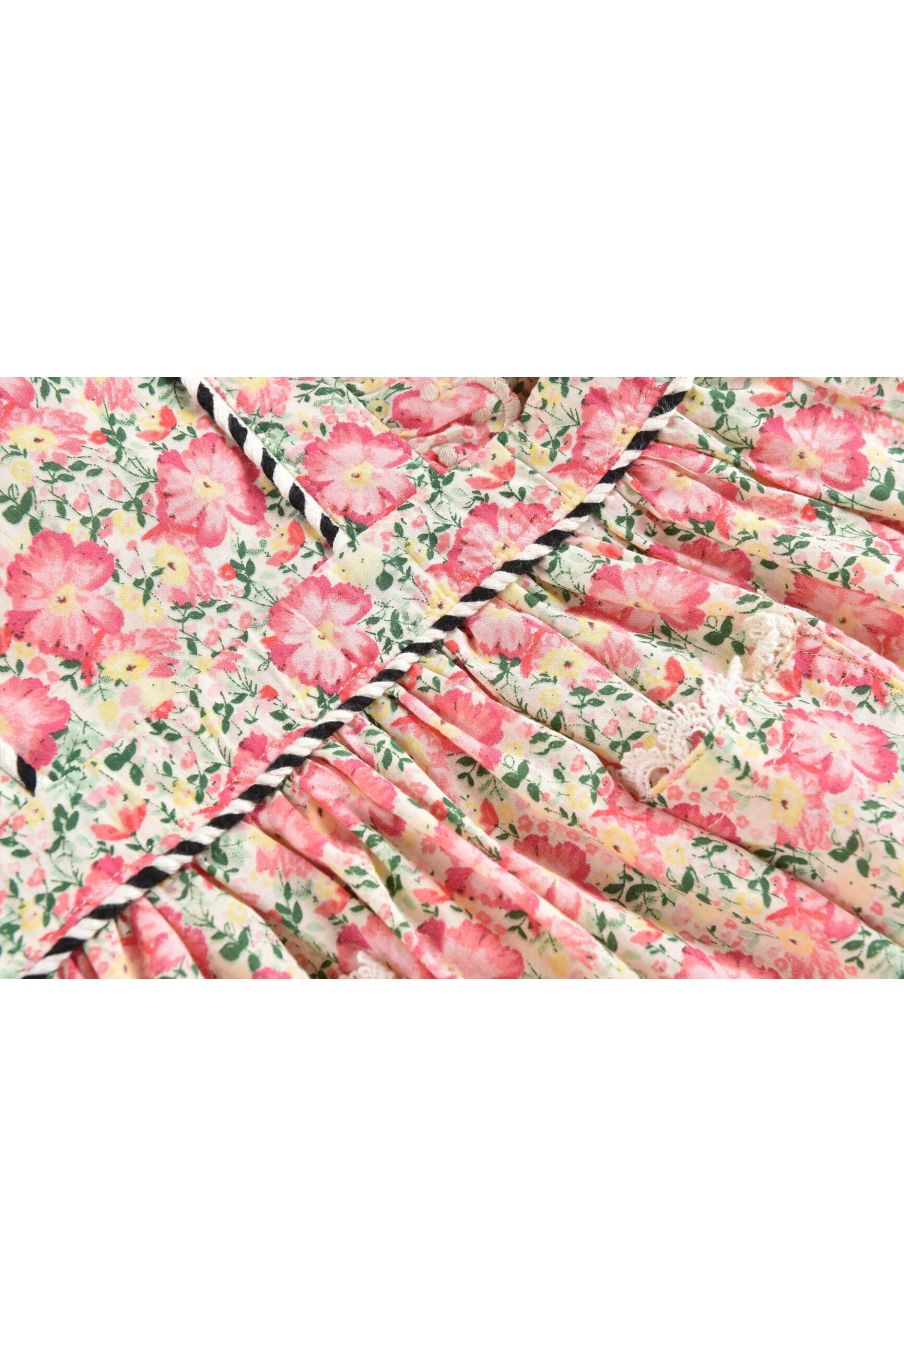 bohemian chic vintage dress girl mistinguette pink meadow